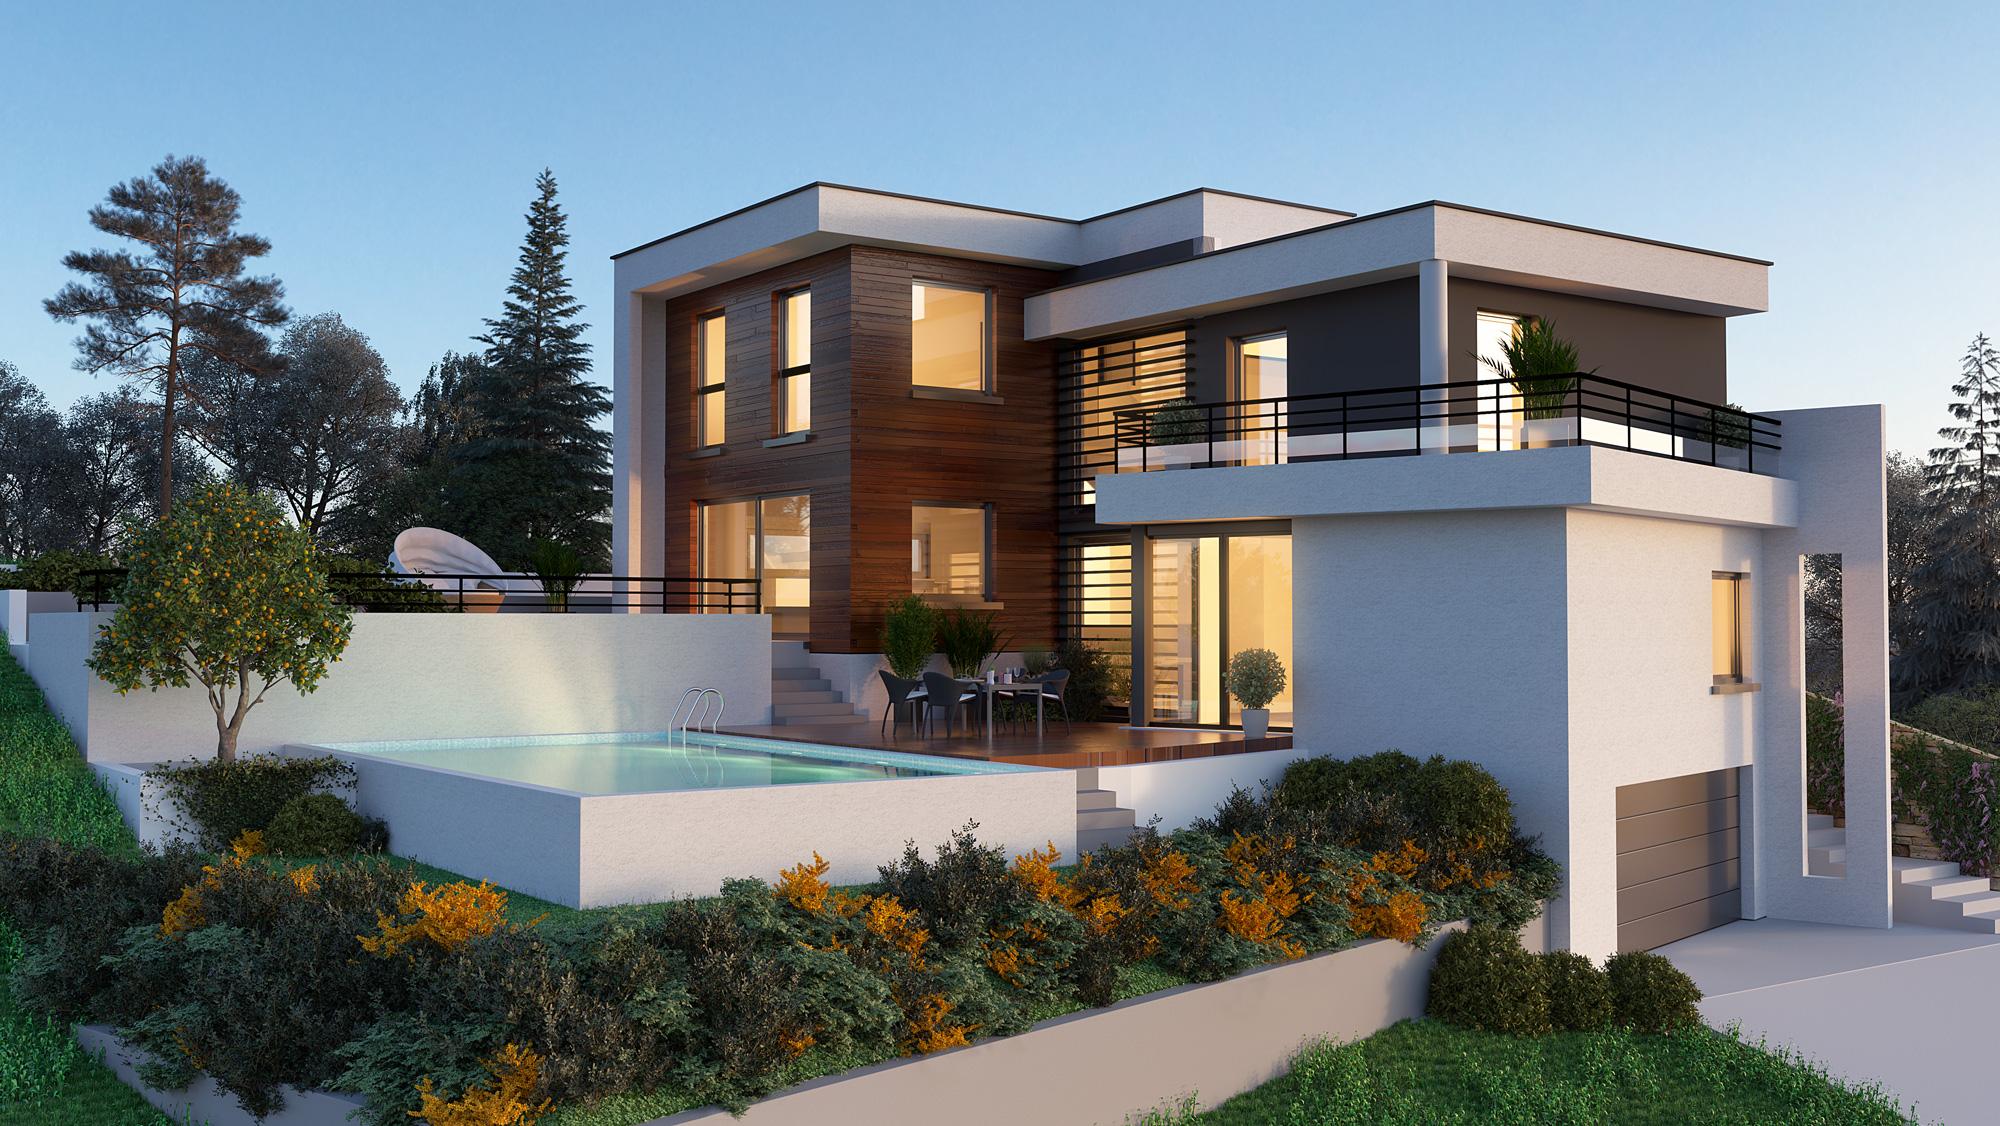 Maisons + Terrains du constructeur PERSPECTIVE • 150 m² • HANGENBIETEN